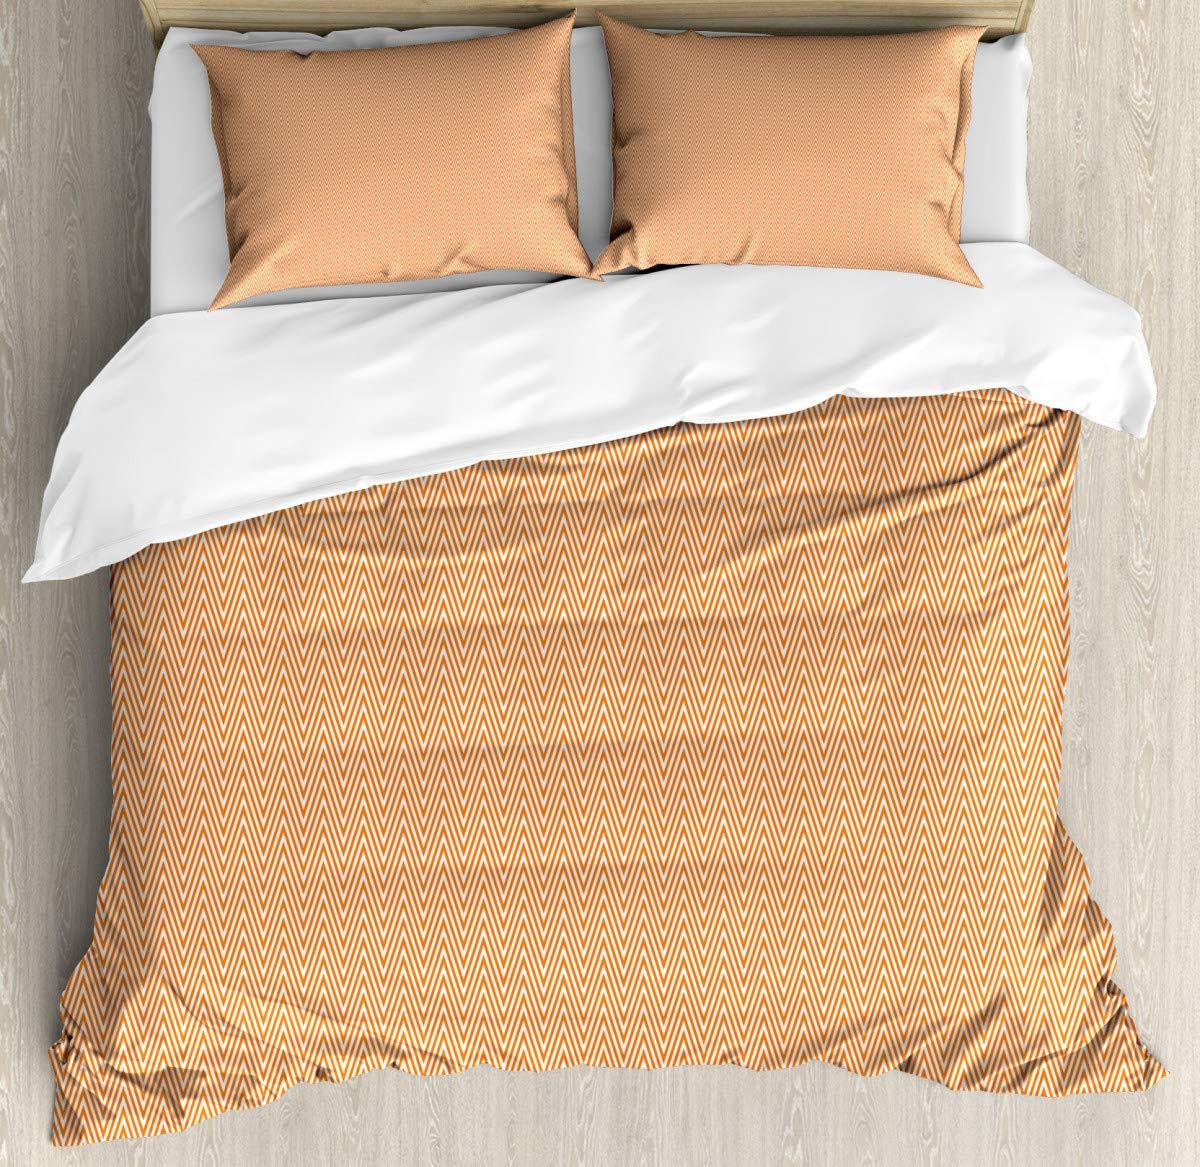 "Duvet Cover Bedding Duvet Cover SetOrange Wavy Stripe Abstract Duvet Cover SetCustom 3 Piece Bedding Set with 2 Pillow Shams,70""x86""/19""x29""inch"